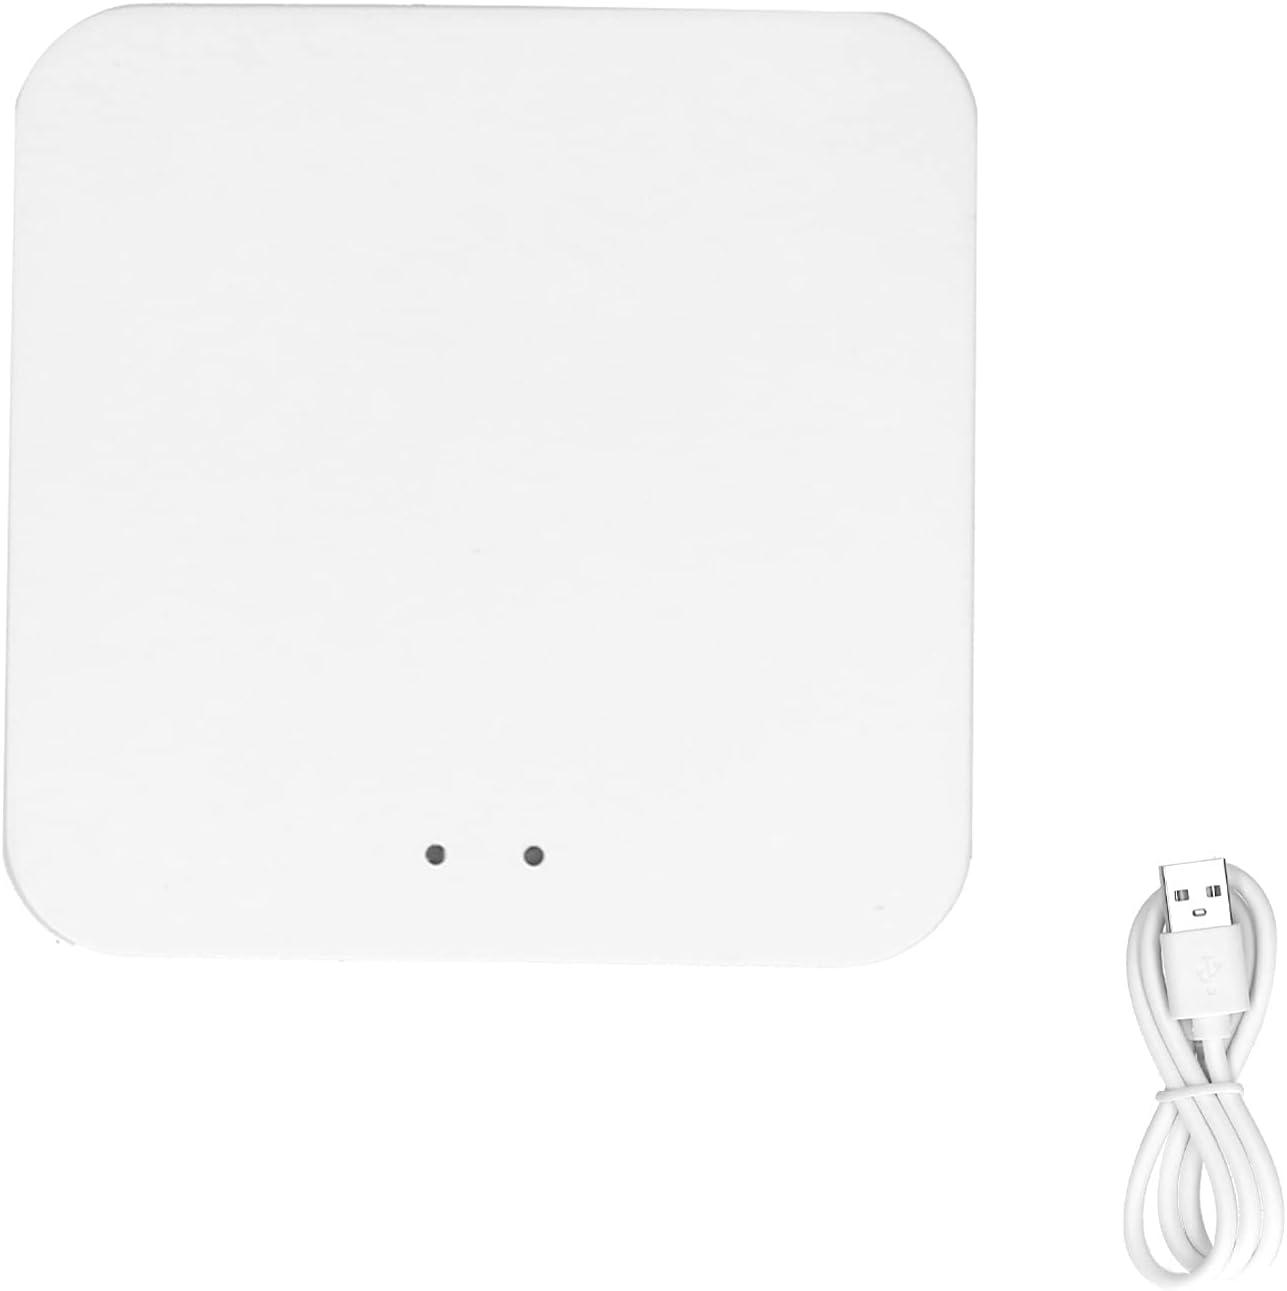 Dioche Smart Wireless Gateway Hub, Home Intelligent WiFi 802.11 B/g/n AI Voice Control for ZigBee 2.0 for TUYA 5V